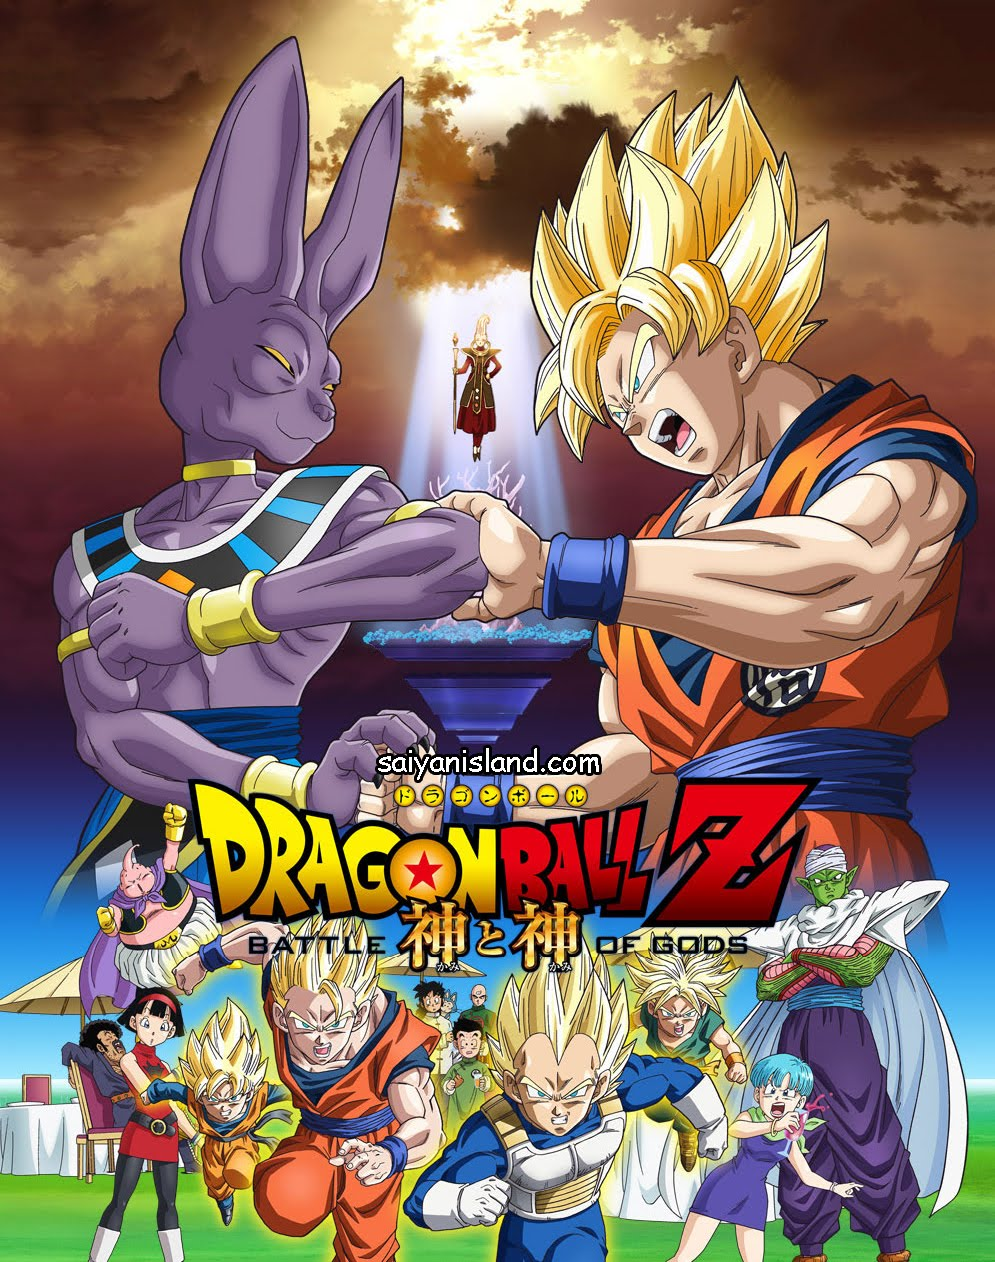 Dragon-Ball-Z-Battle-of-Gods-Poster   Daily mars